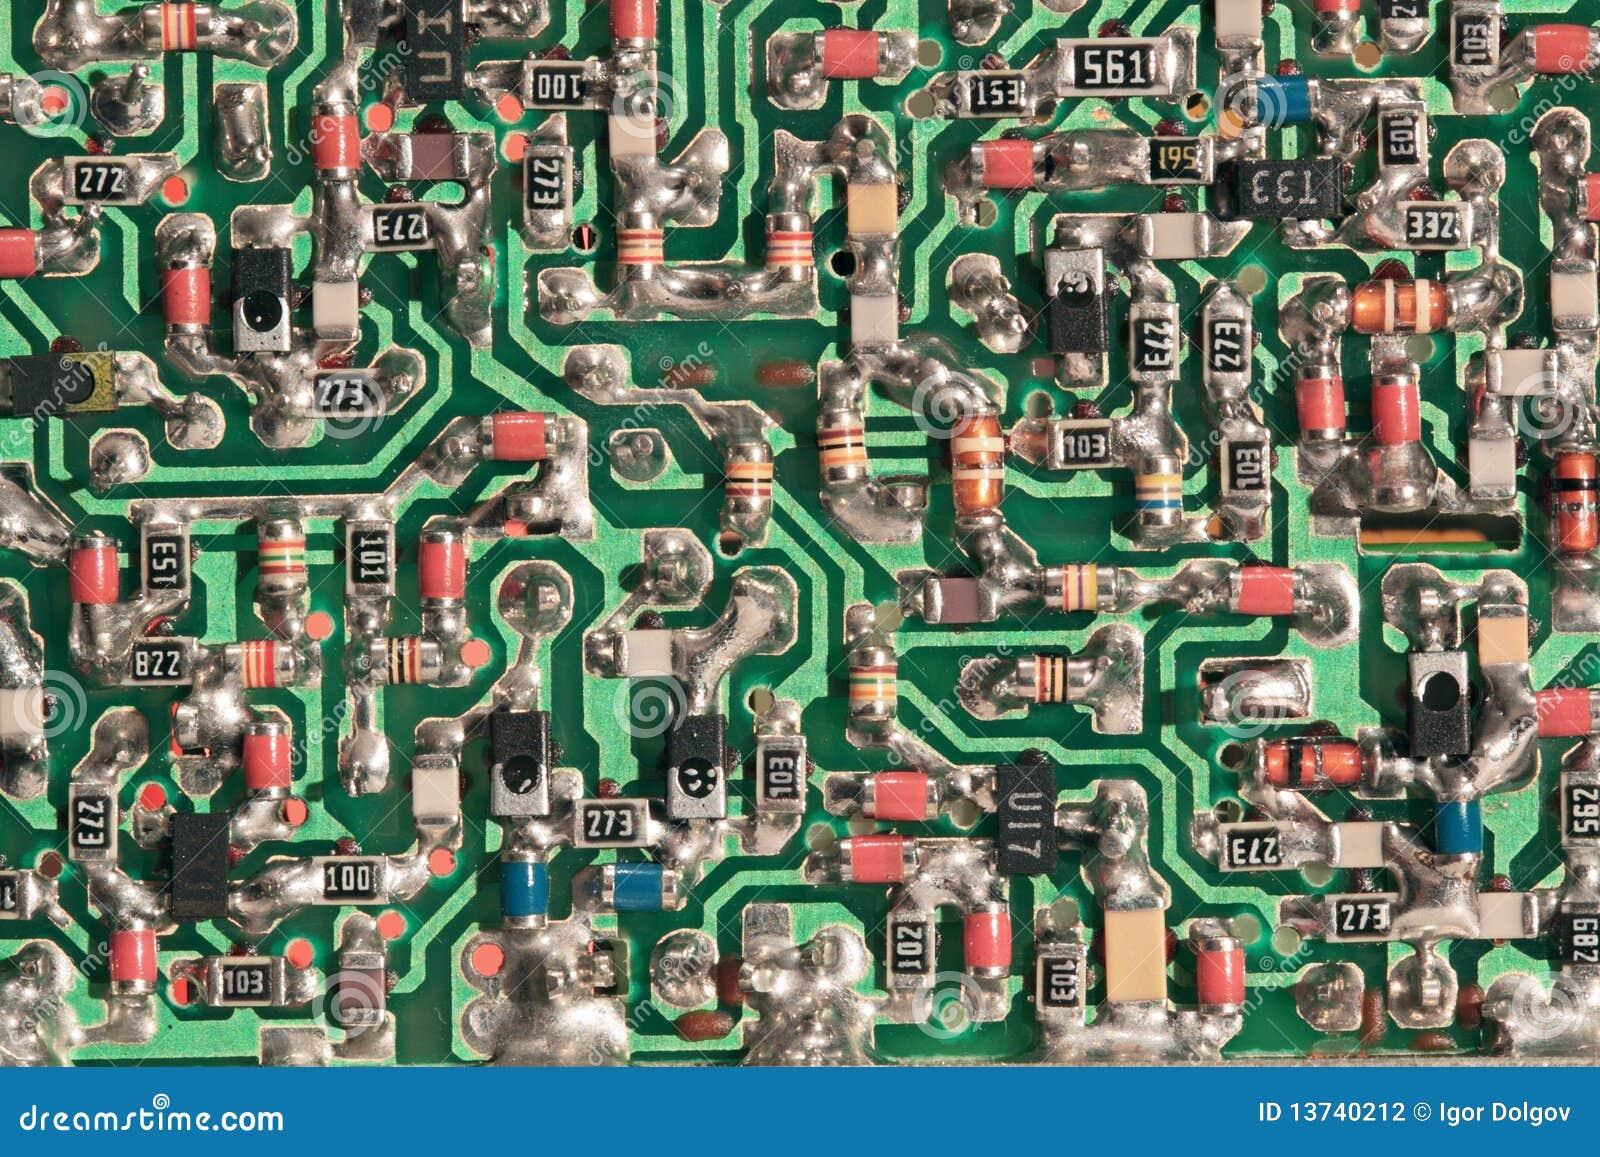 Circuito Impreso : Tarjeta de circuito impreso foto de archivo imagen de impreso